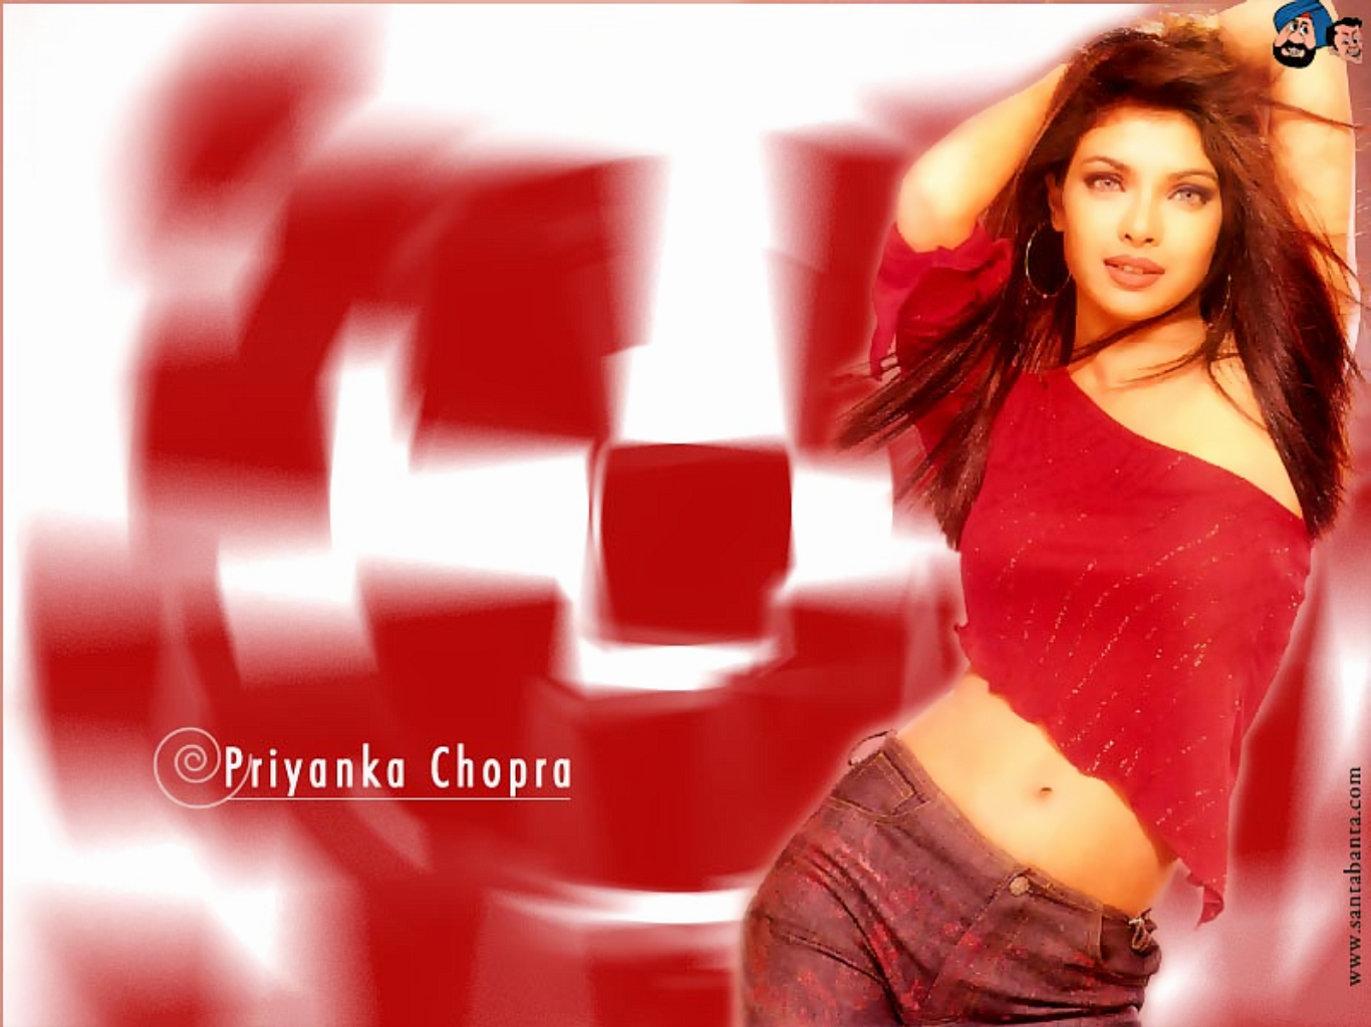 Priyanka Chopra Unseen Hot Wallpaper